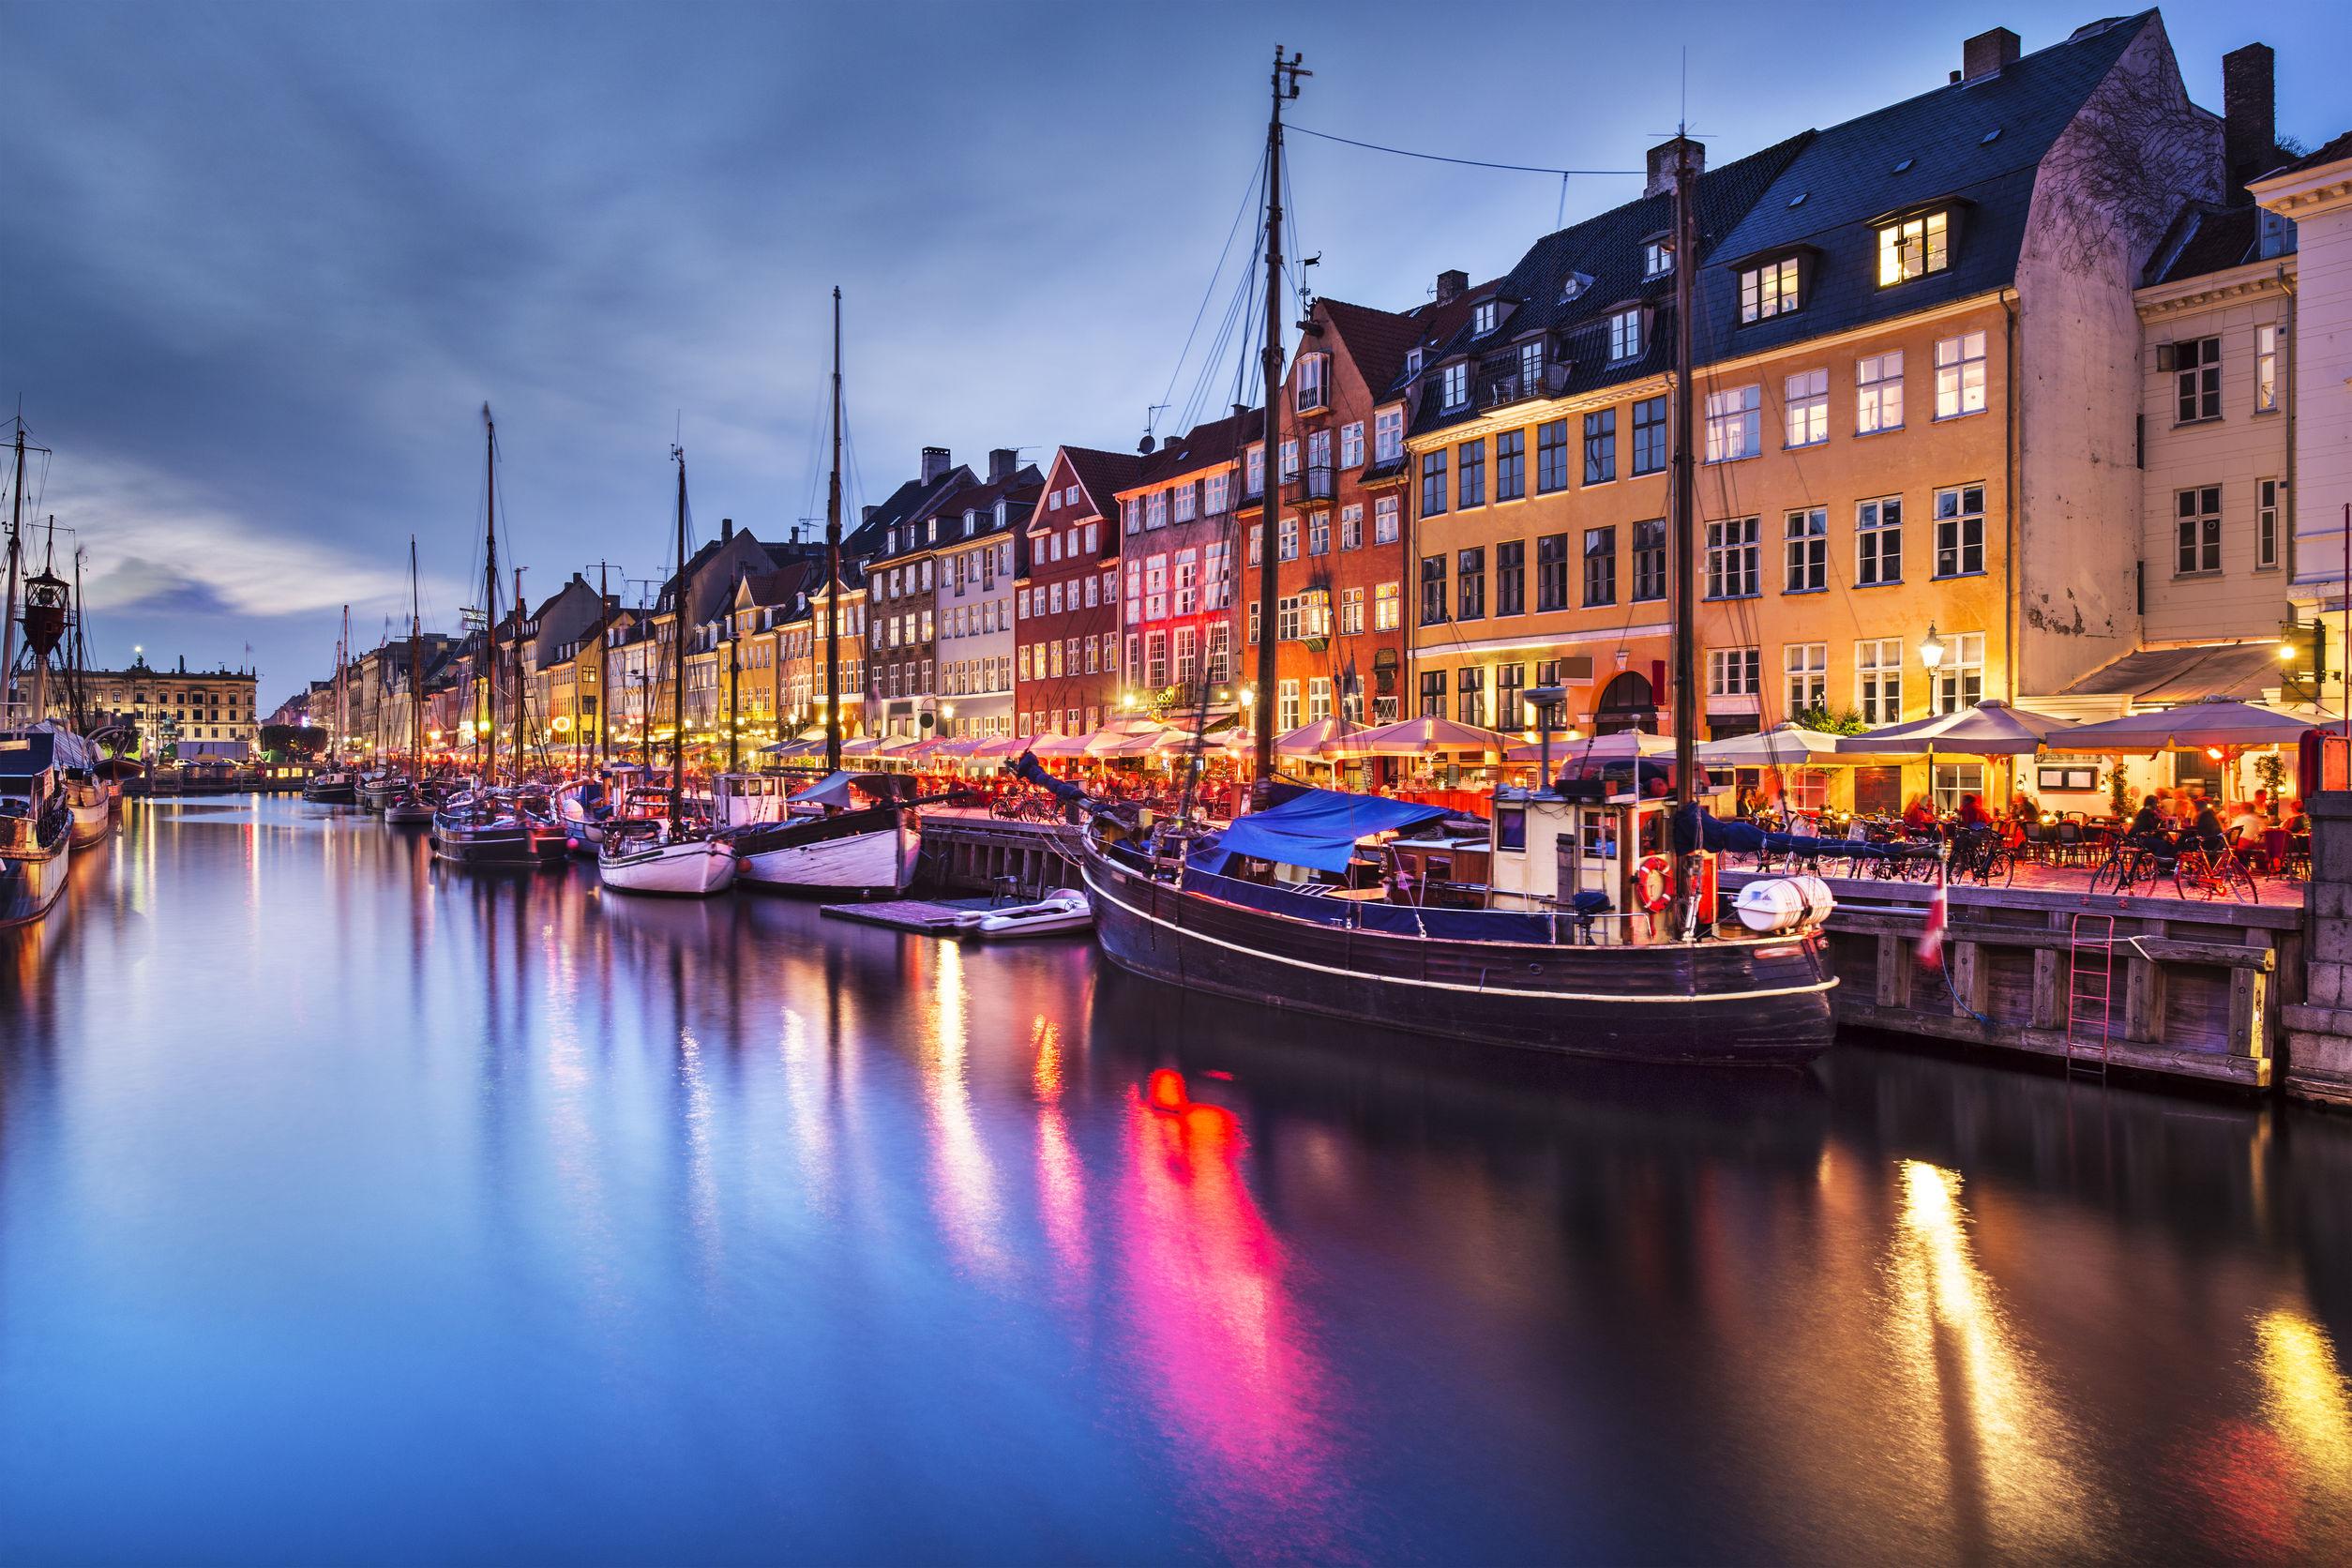 Download Wallpaper Awesome Cityscape Wallpaper Copenhagen 2508x1672